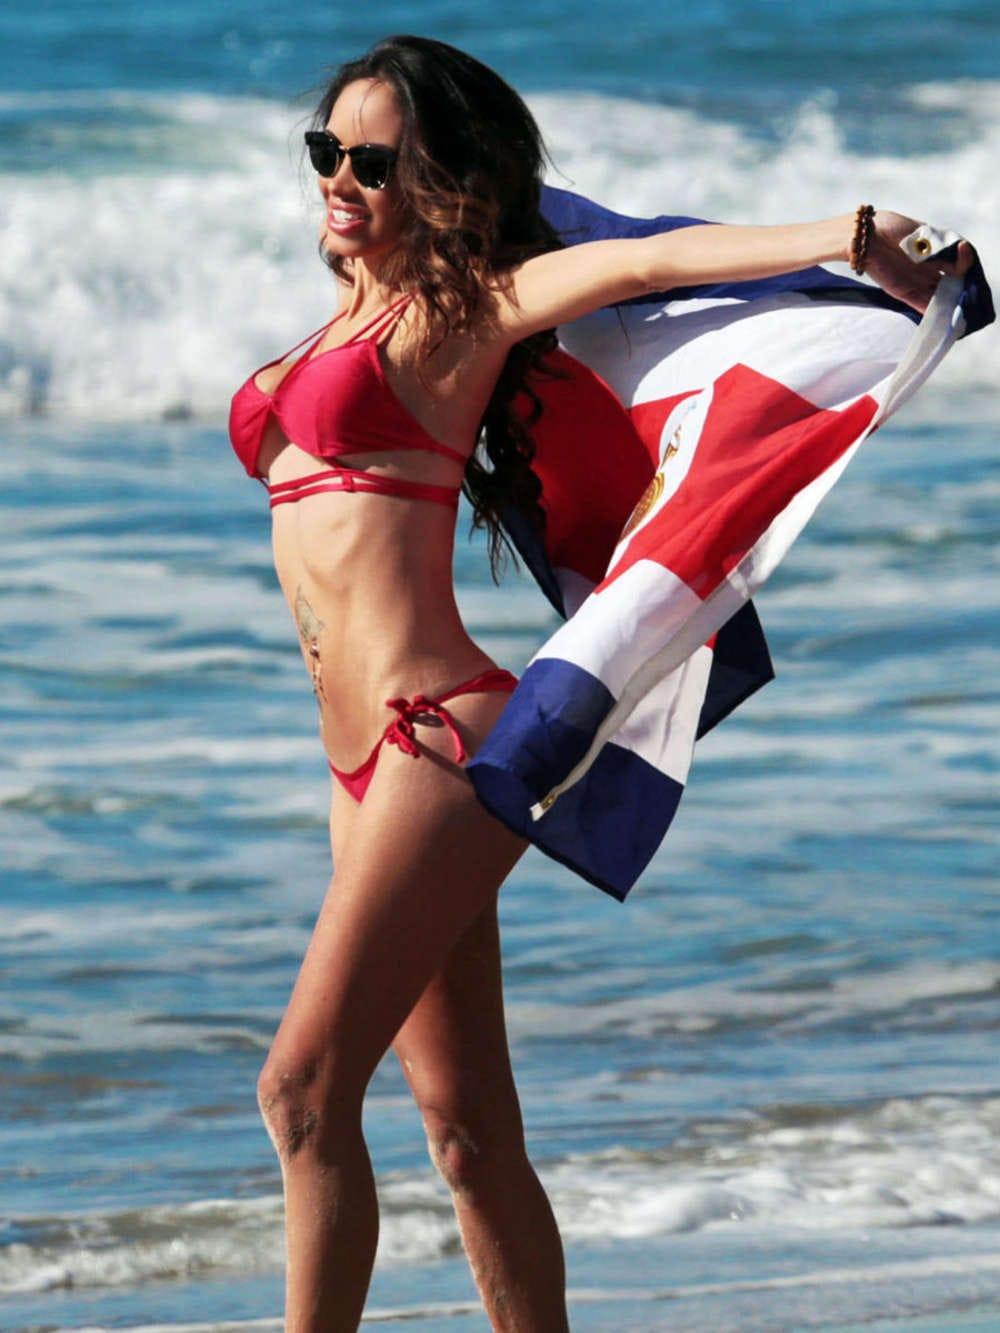 Bikini Ari Lezama nudes (54 images), Selfie